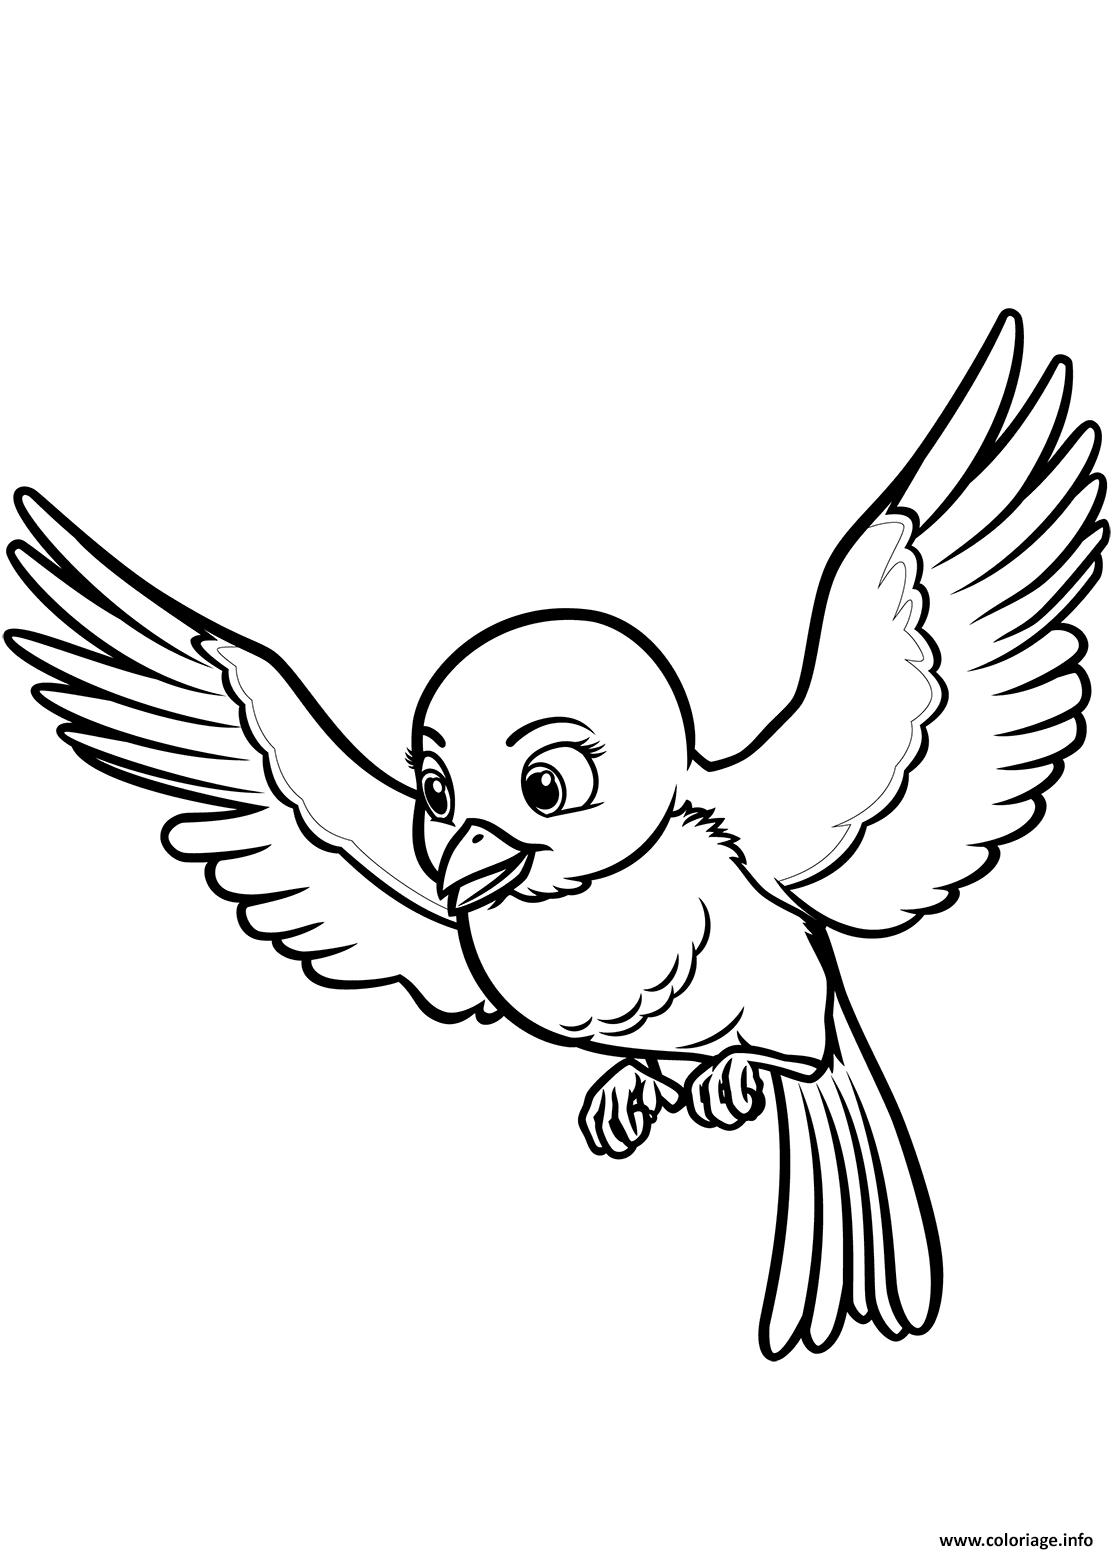 Coloriage Mia Le Oiseau De Princesse Sofia Disney dessin